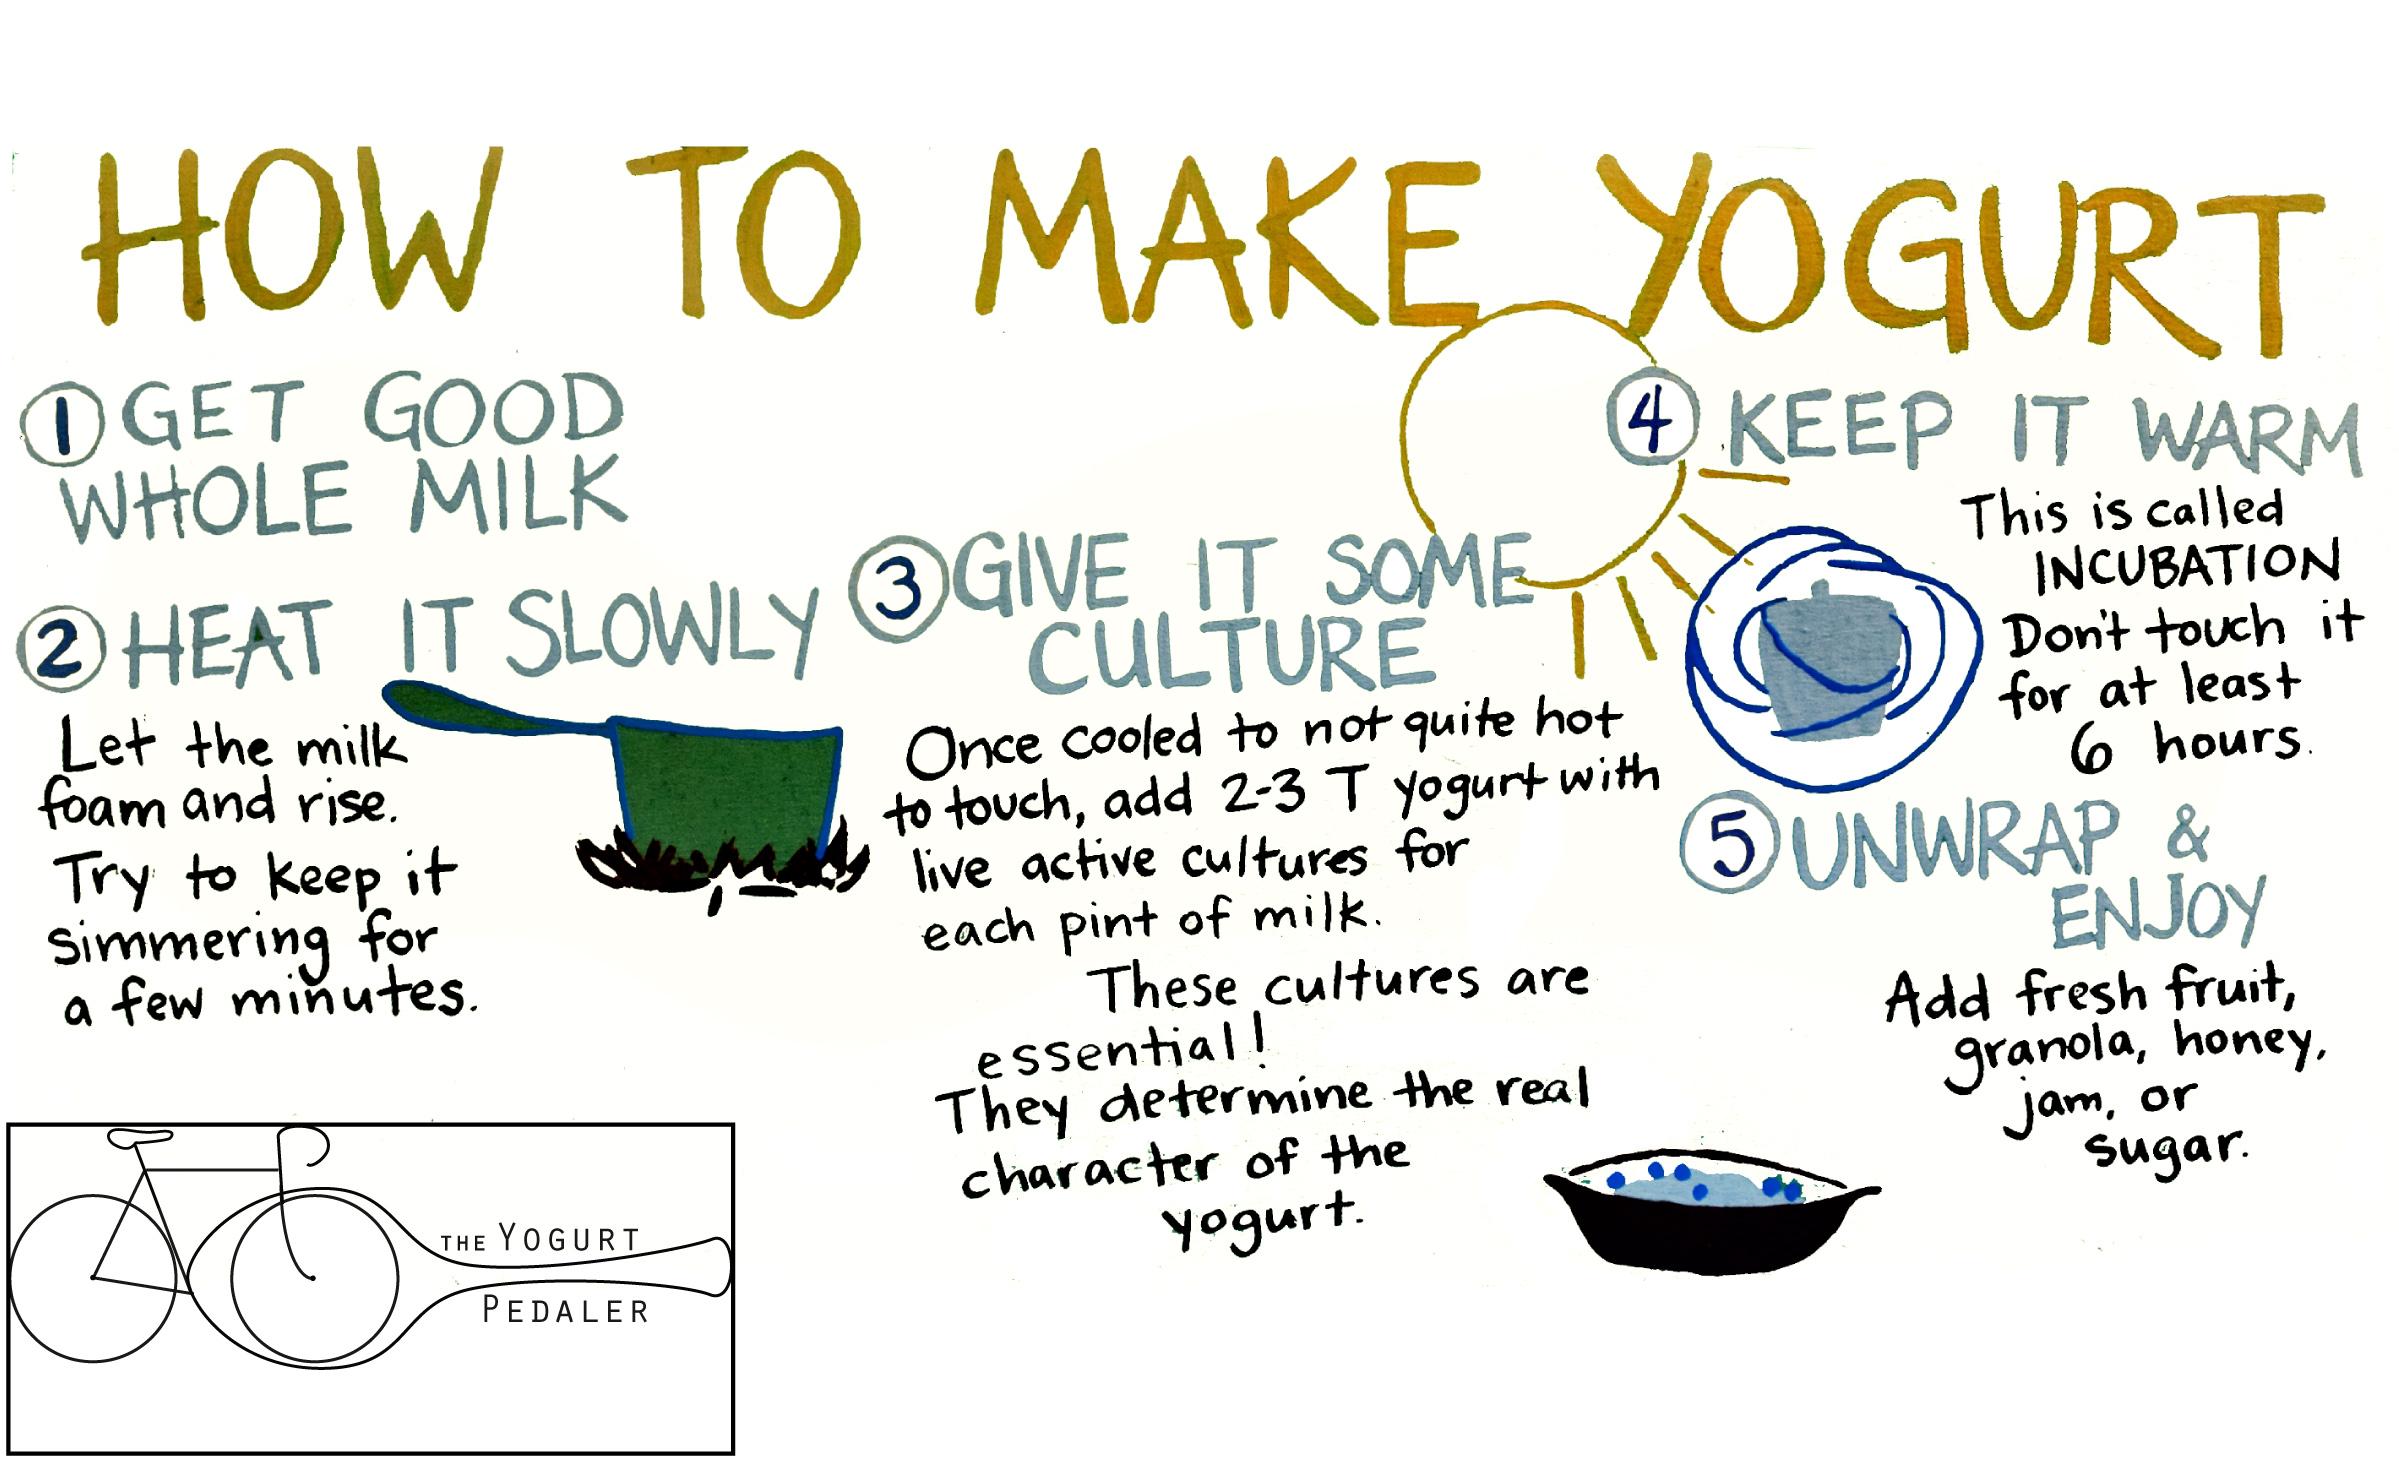 how to make yogurt without a machine